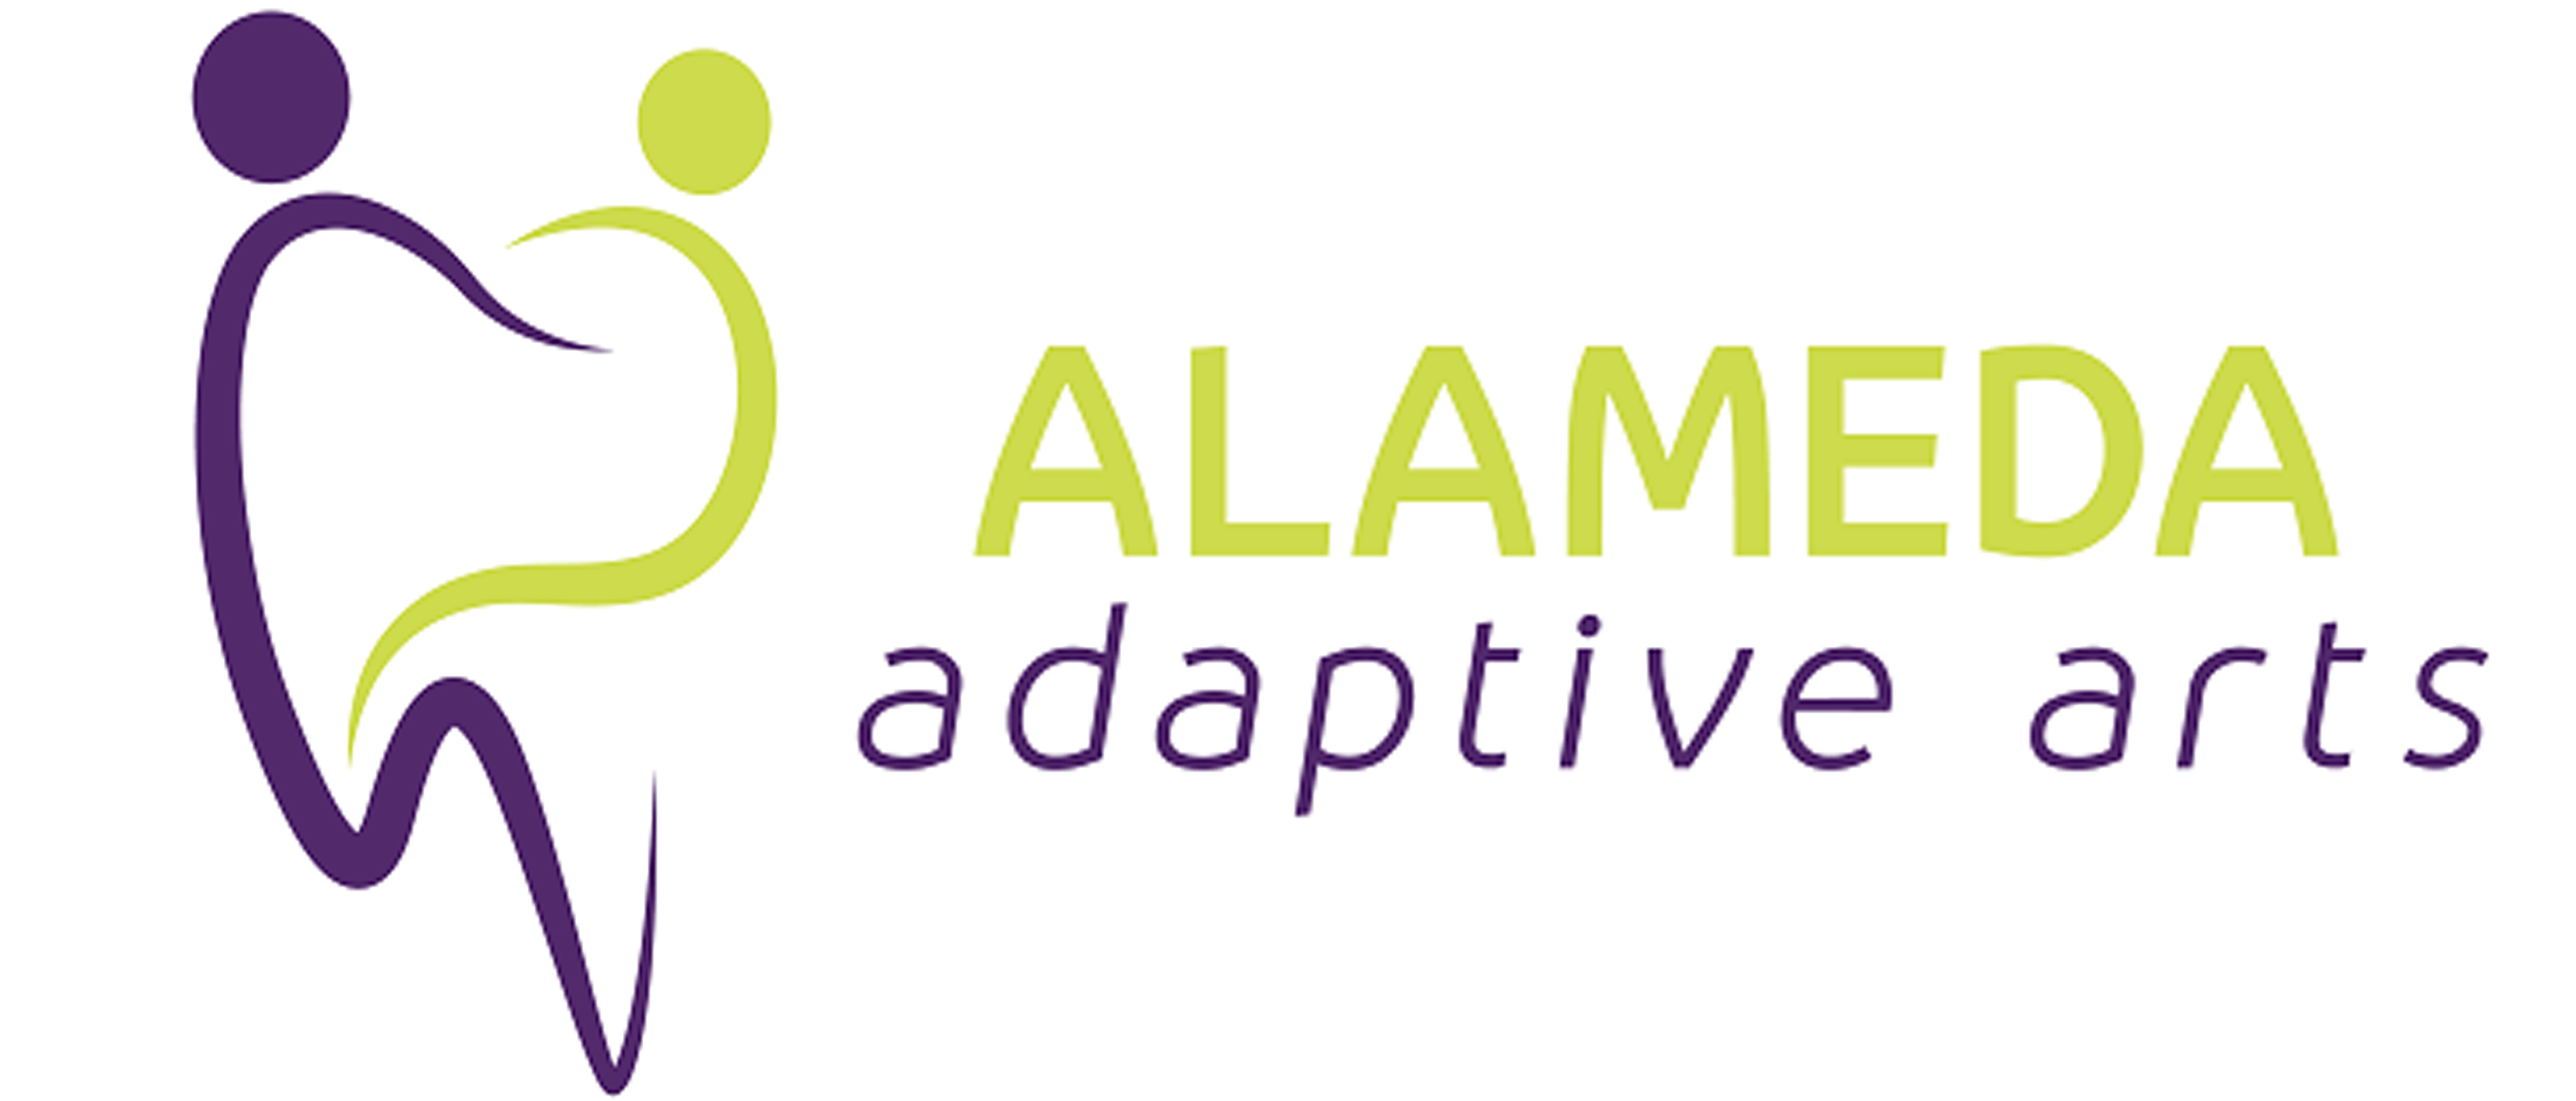 Alameda Adaptive Arts